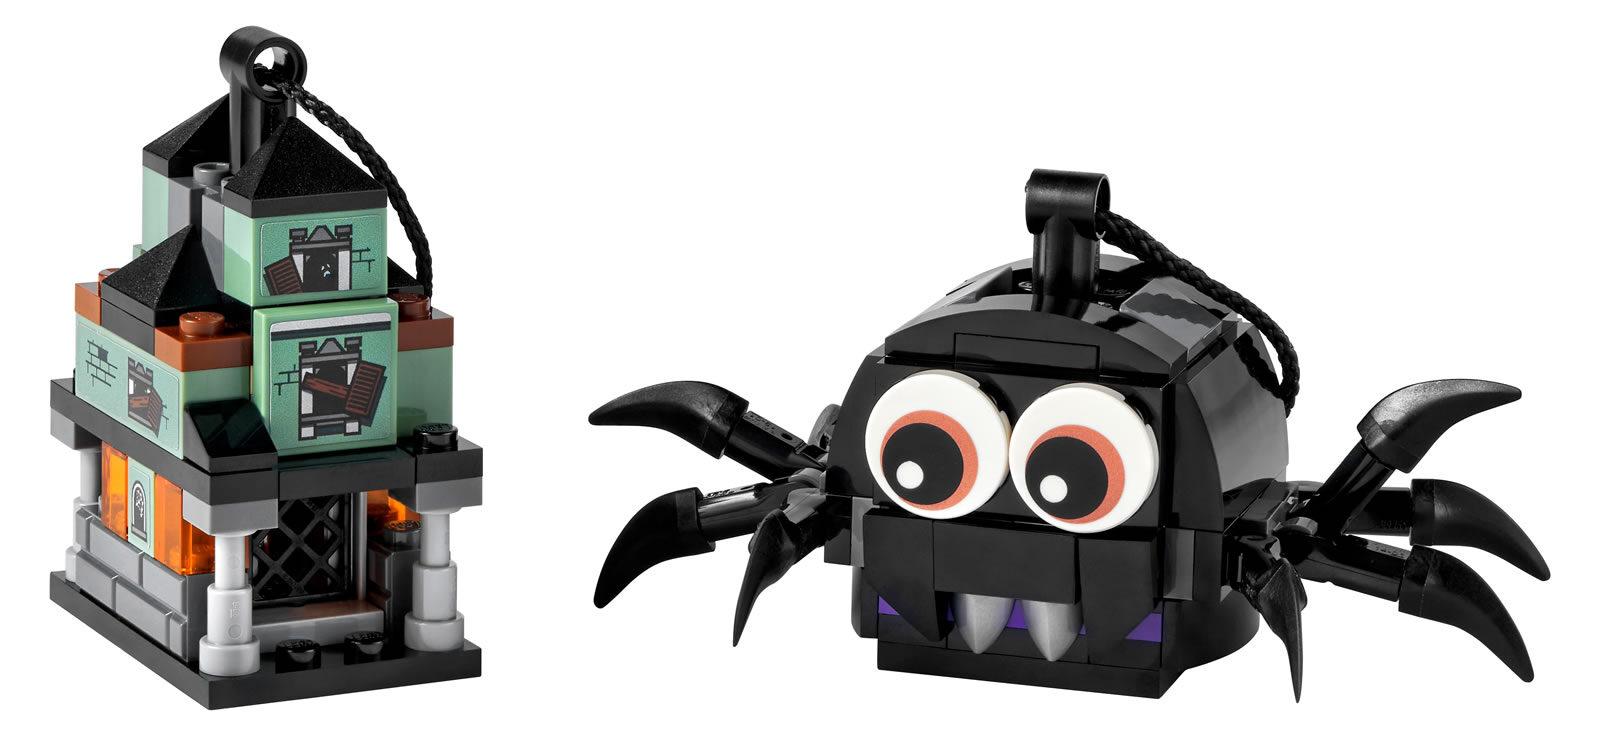 LEGO 40493 Spider & Haunted House